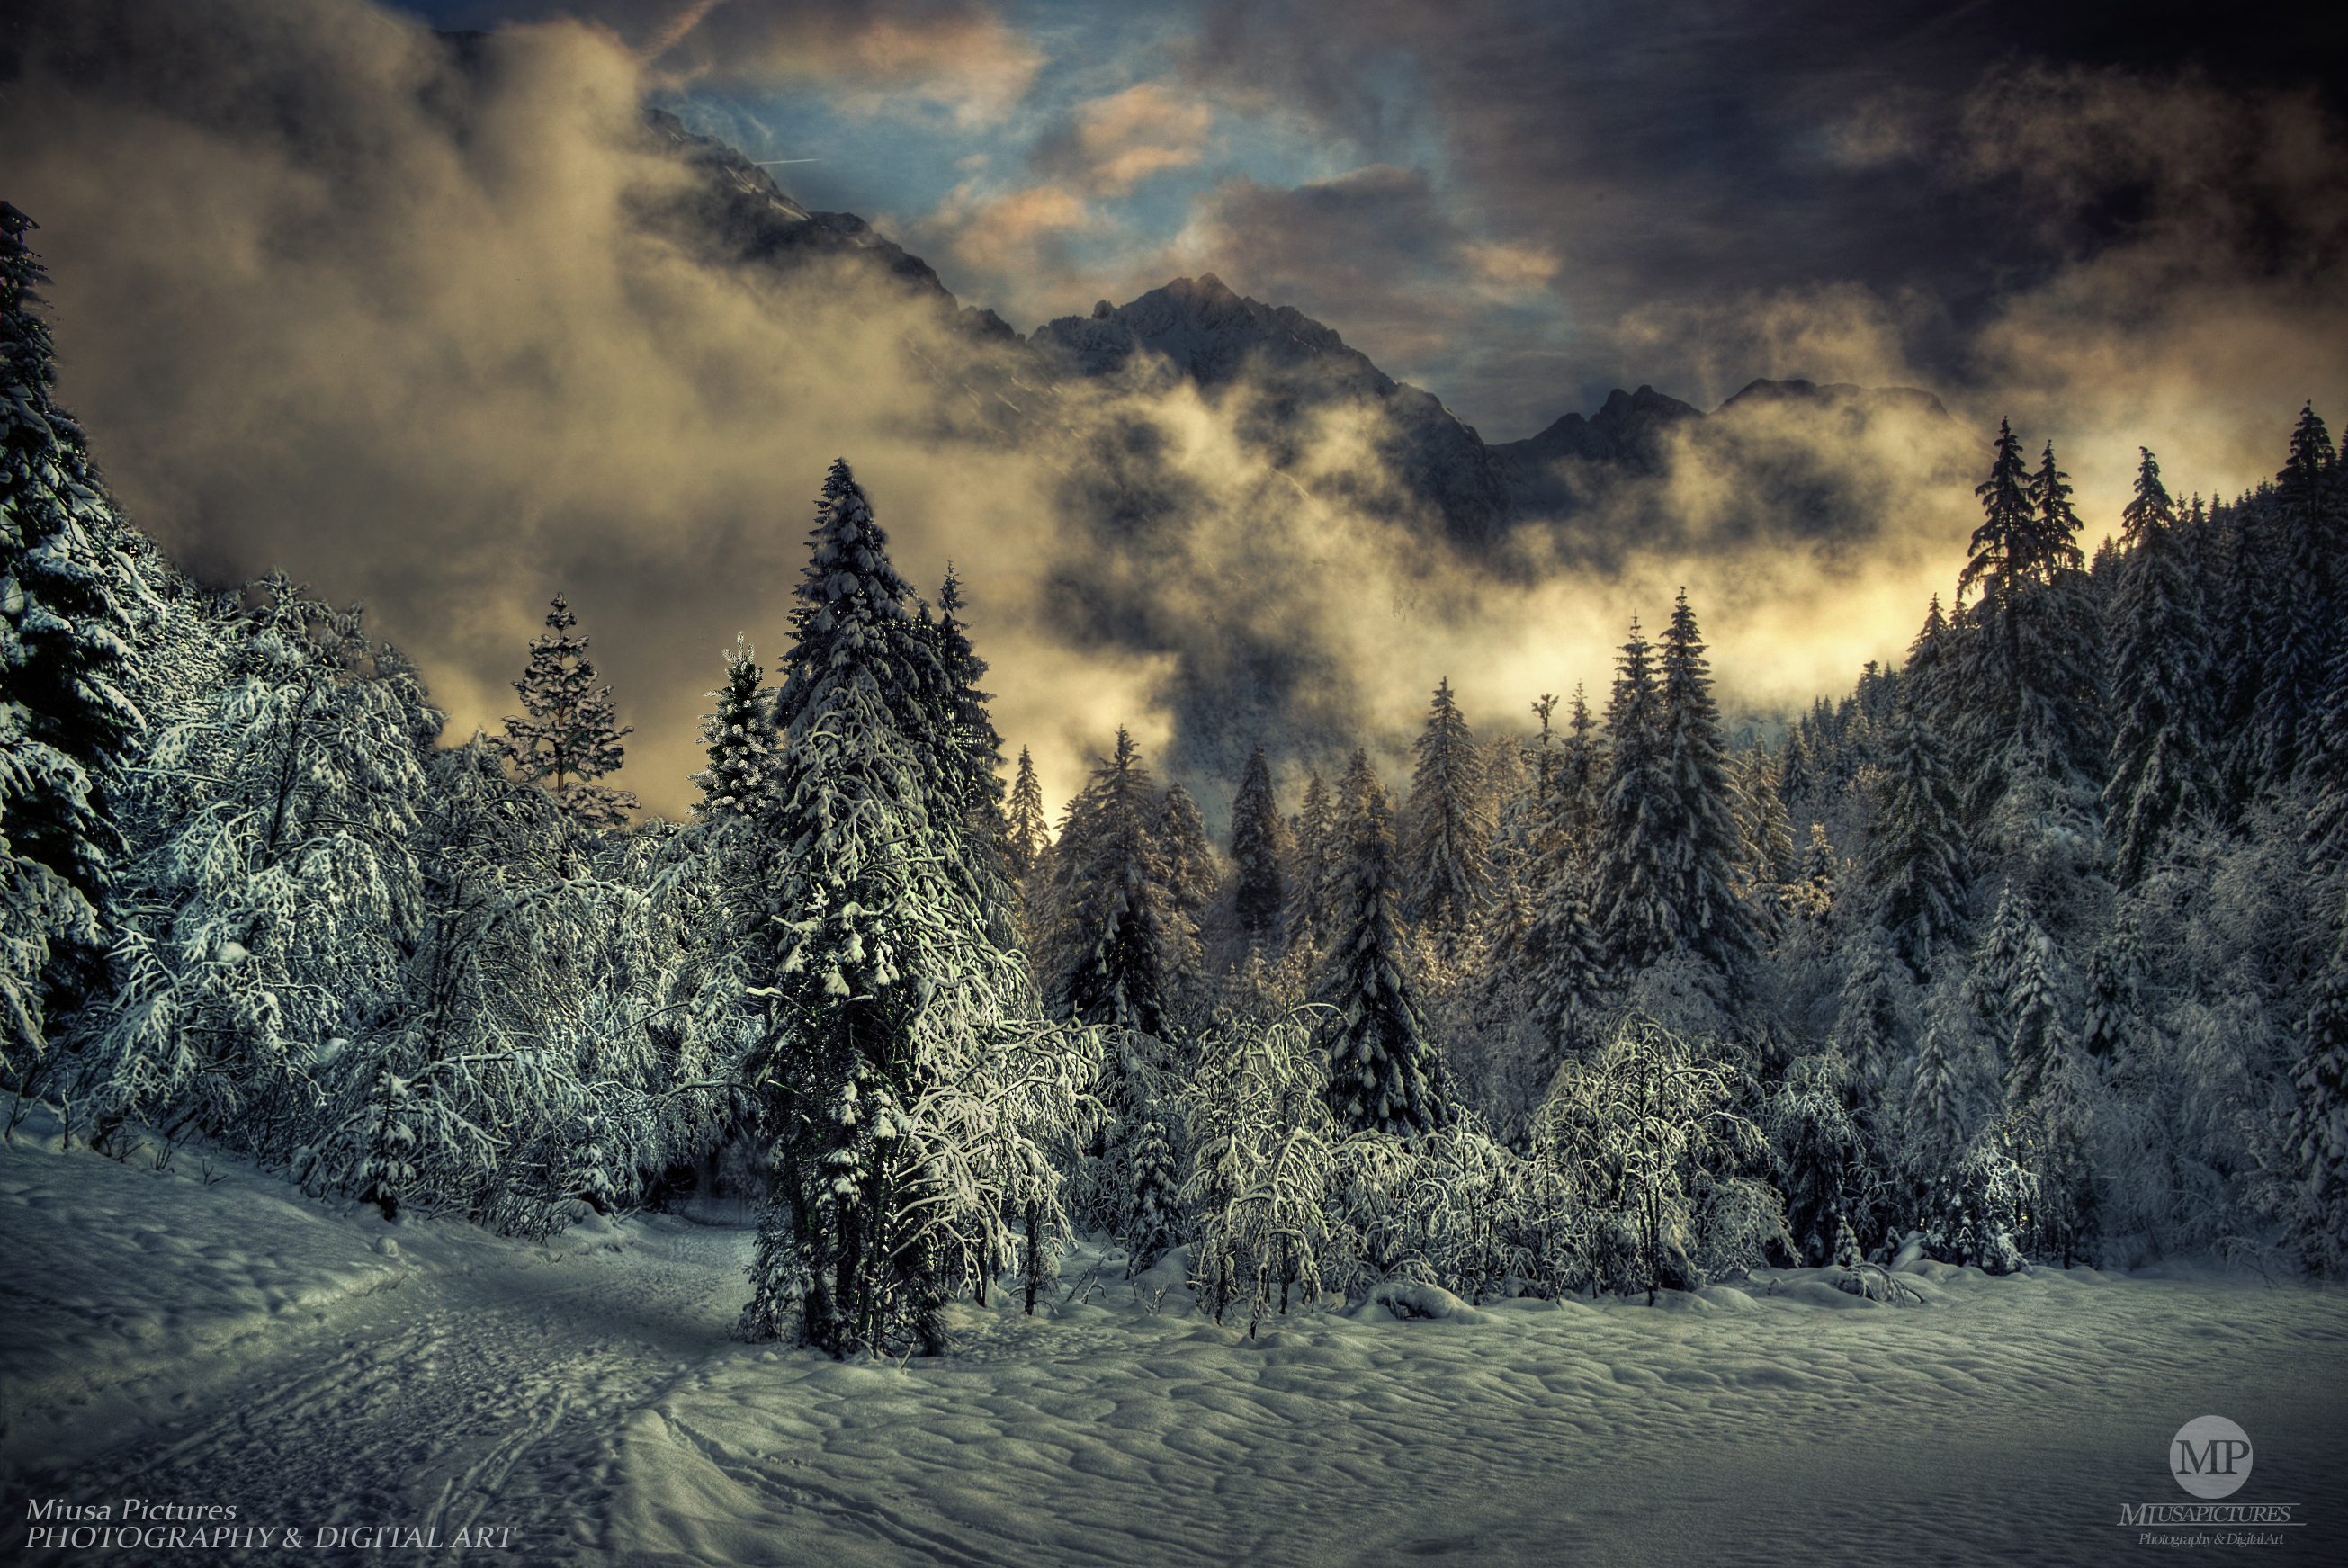 Winter Landscape by MiusaPictures